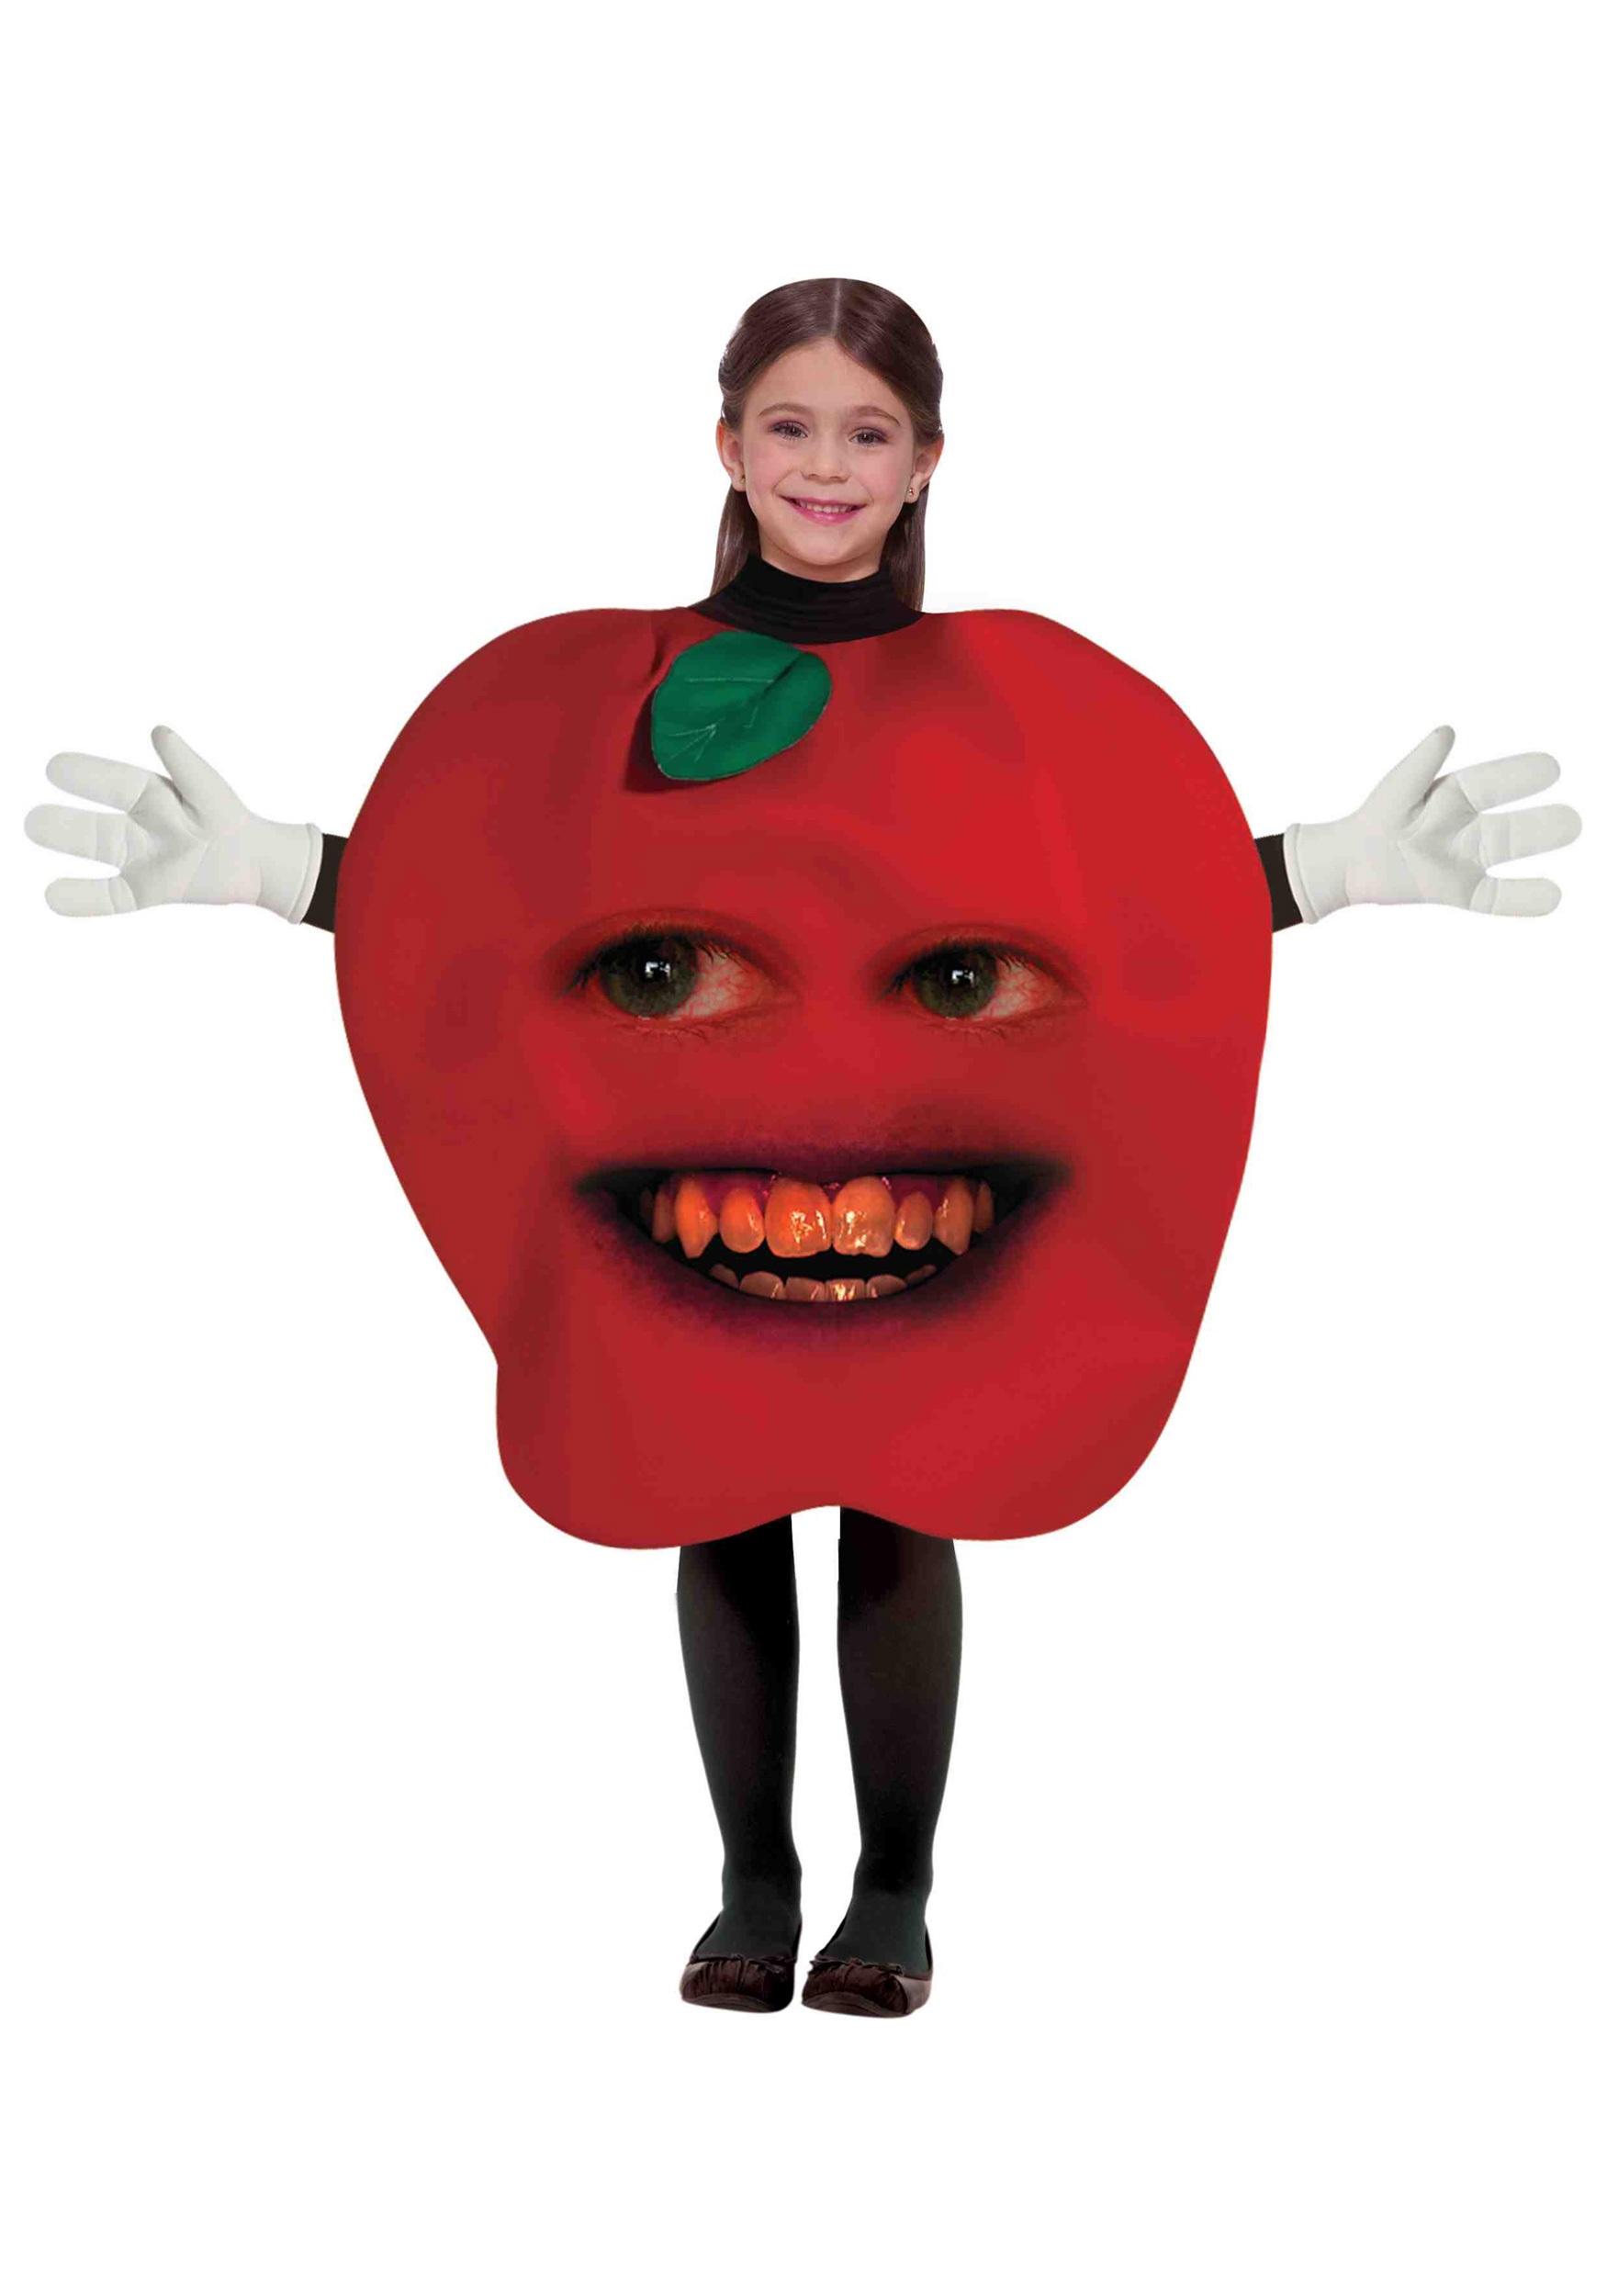 Child Midget Apple Costume  sc 1 st  Halloween Costumes & Child Midget Apple Costume - Halloween Costumes